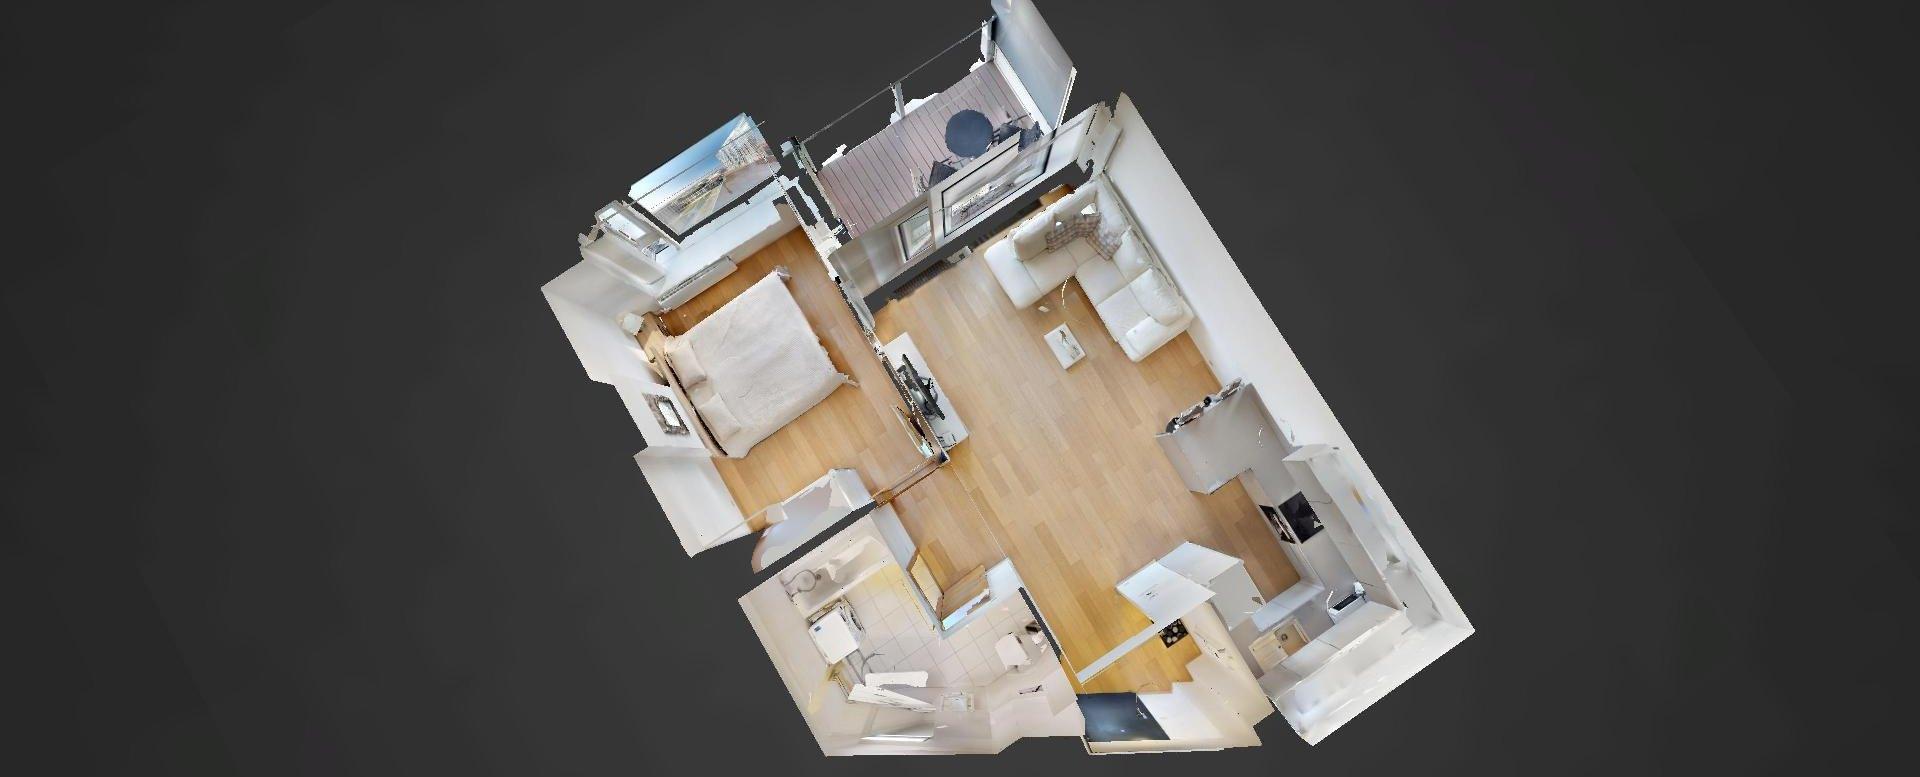 3D pôdorys 2-izbového bytu v Panorama Towers - Eurovea City